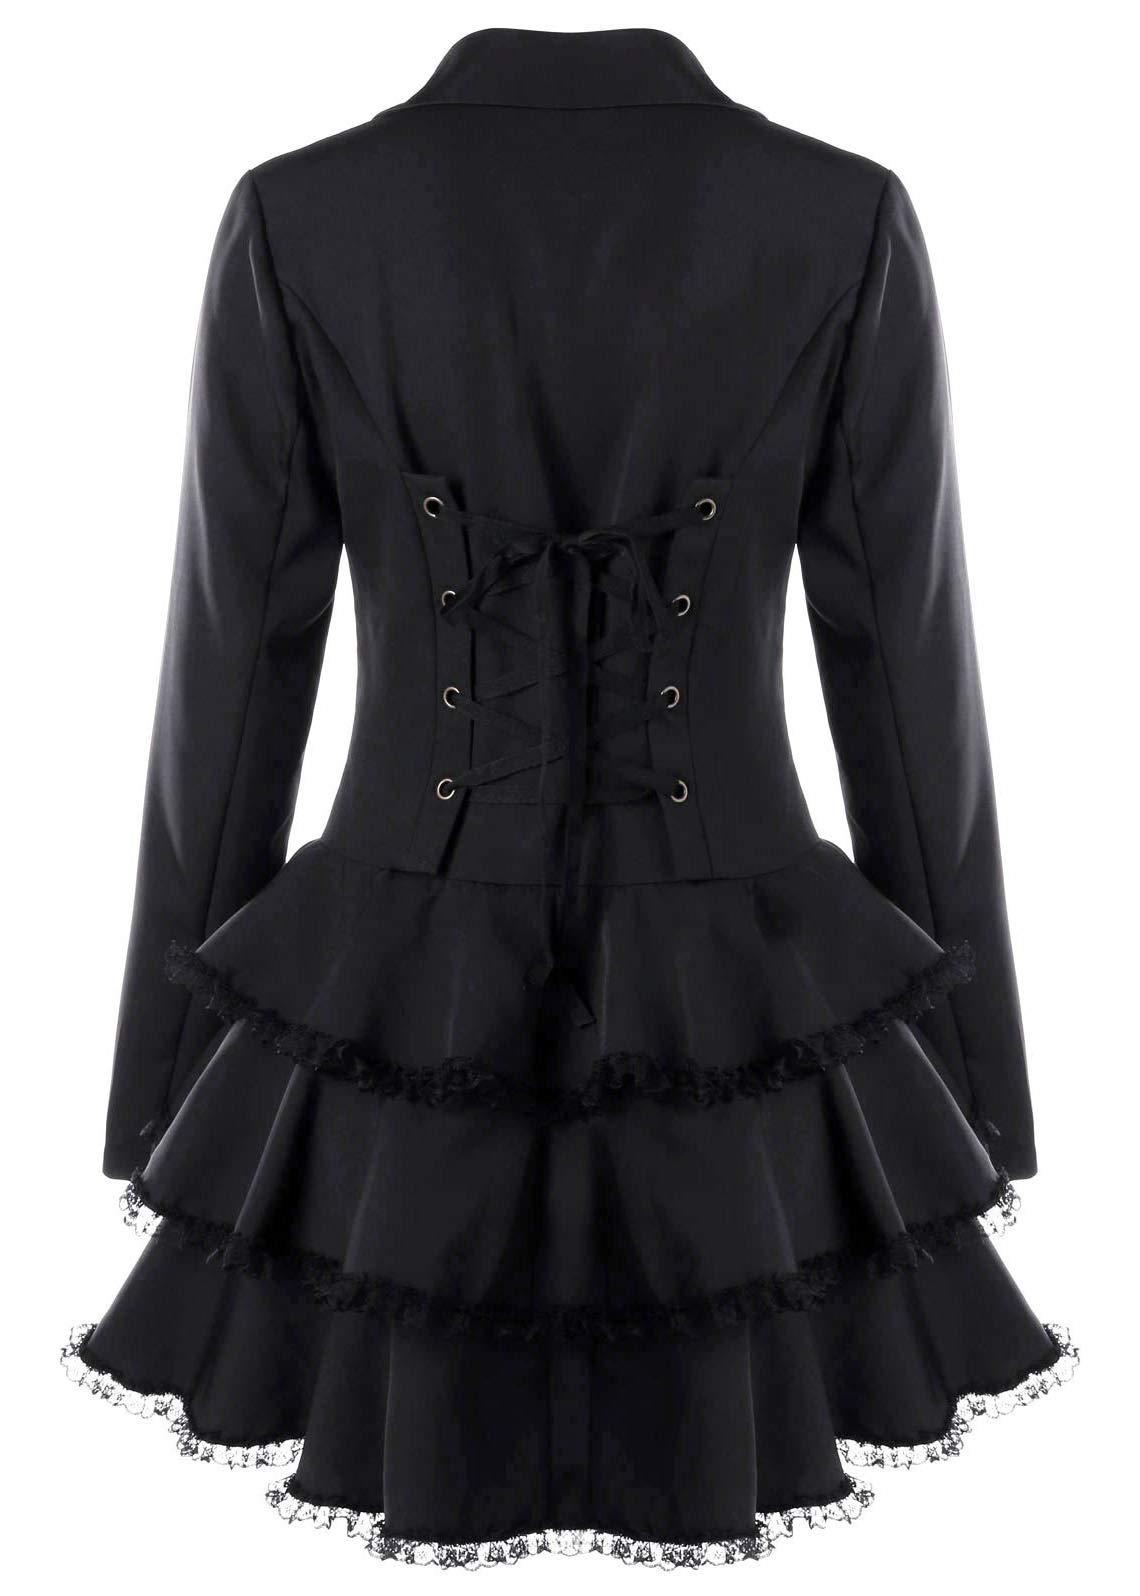 Nihsatin Women's Double Breasted Victorian Steampunk Blazer Coat Jacket with Lace Hem 4